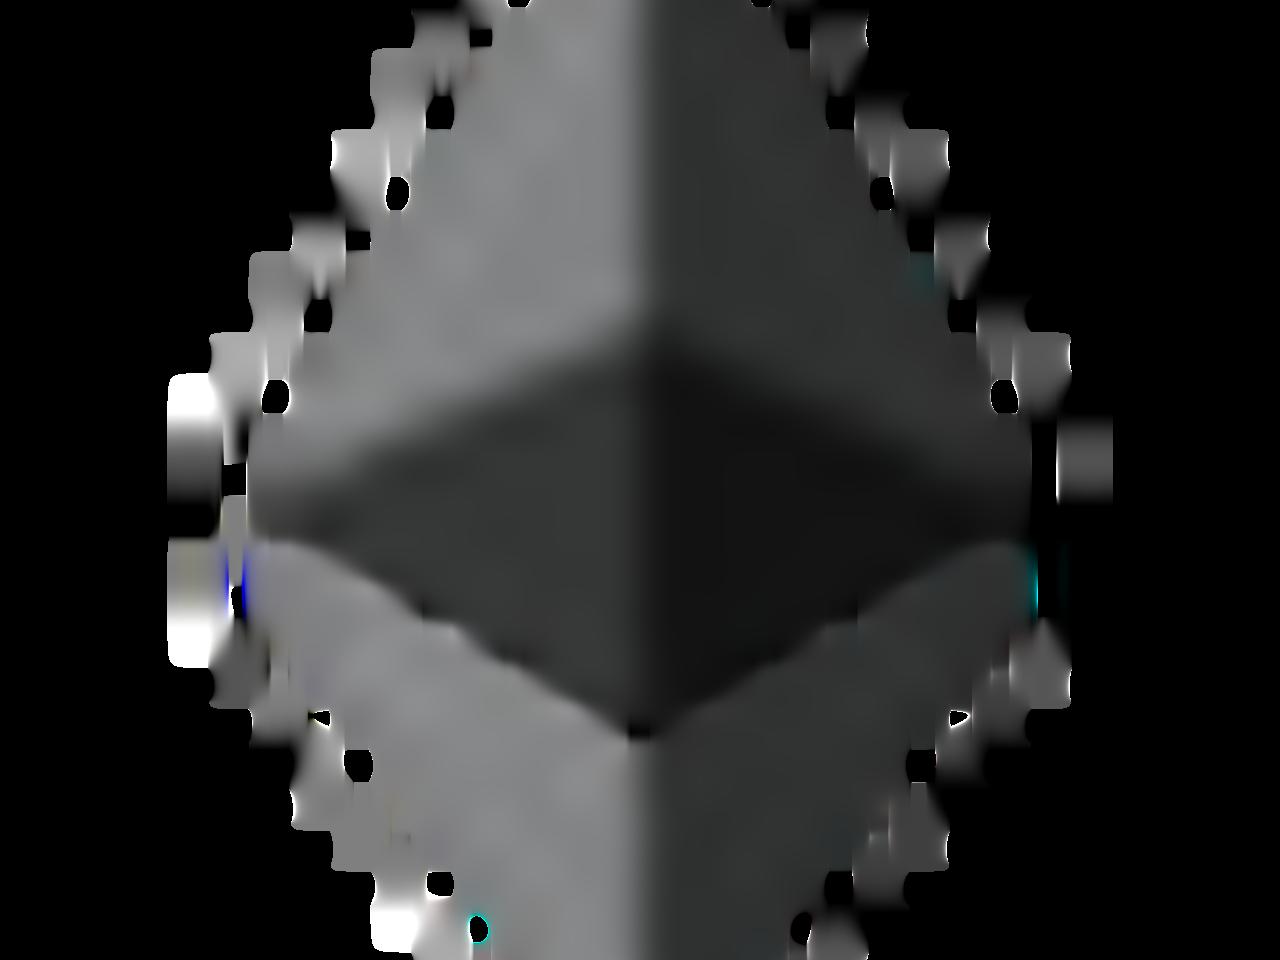 Crytpo-AI-based-decision-making